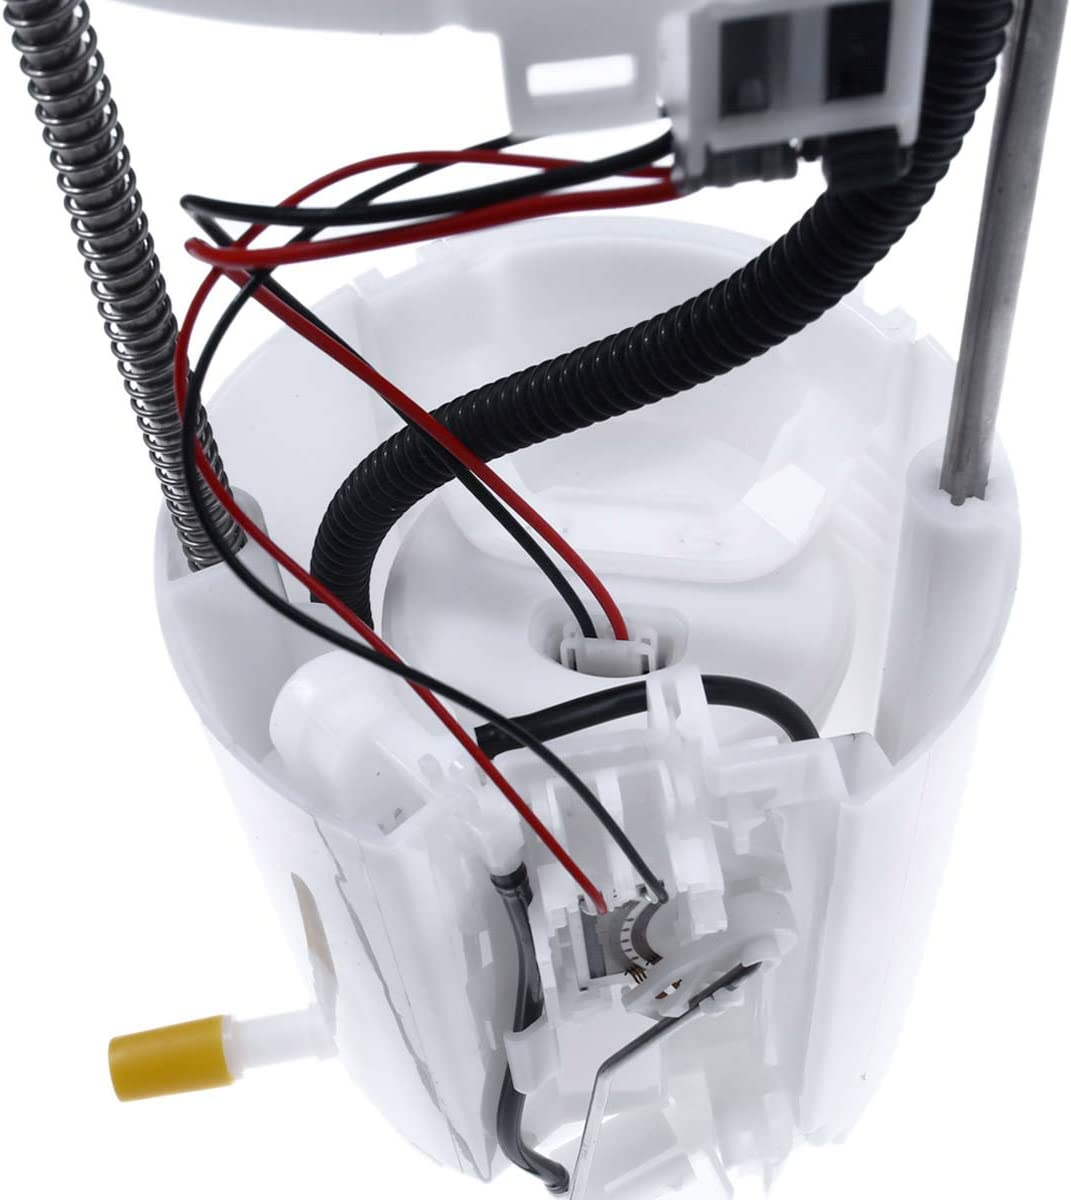 A-Premium Fuel Pump Assembly Compatible with Suzuki Grand Vitara 2006-2008 V6 2.7L